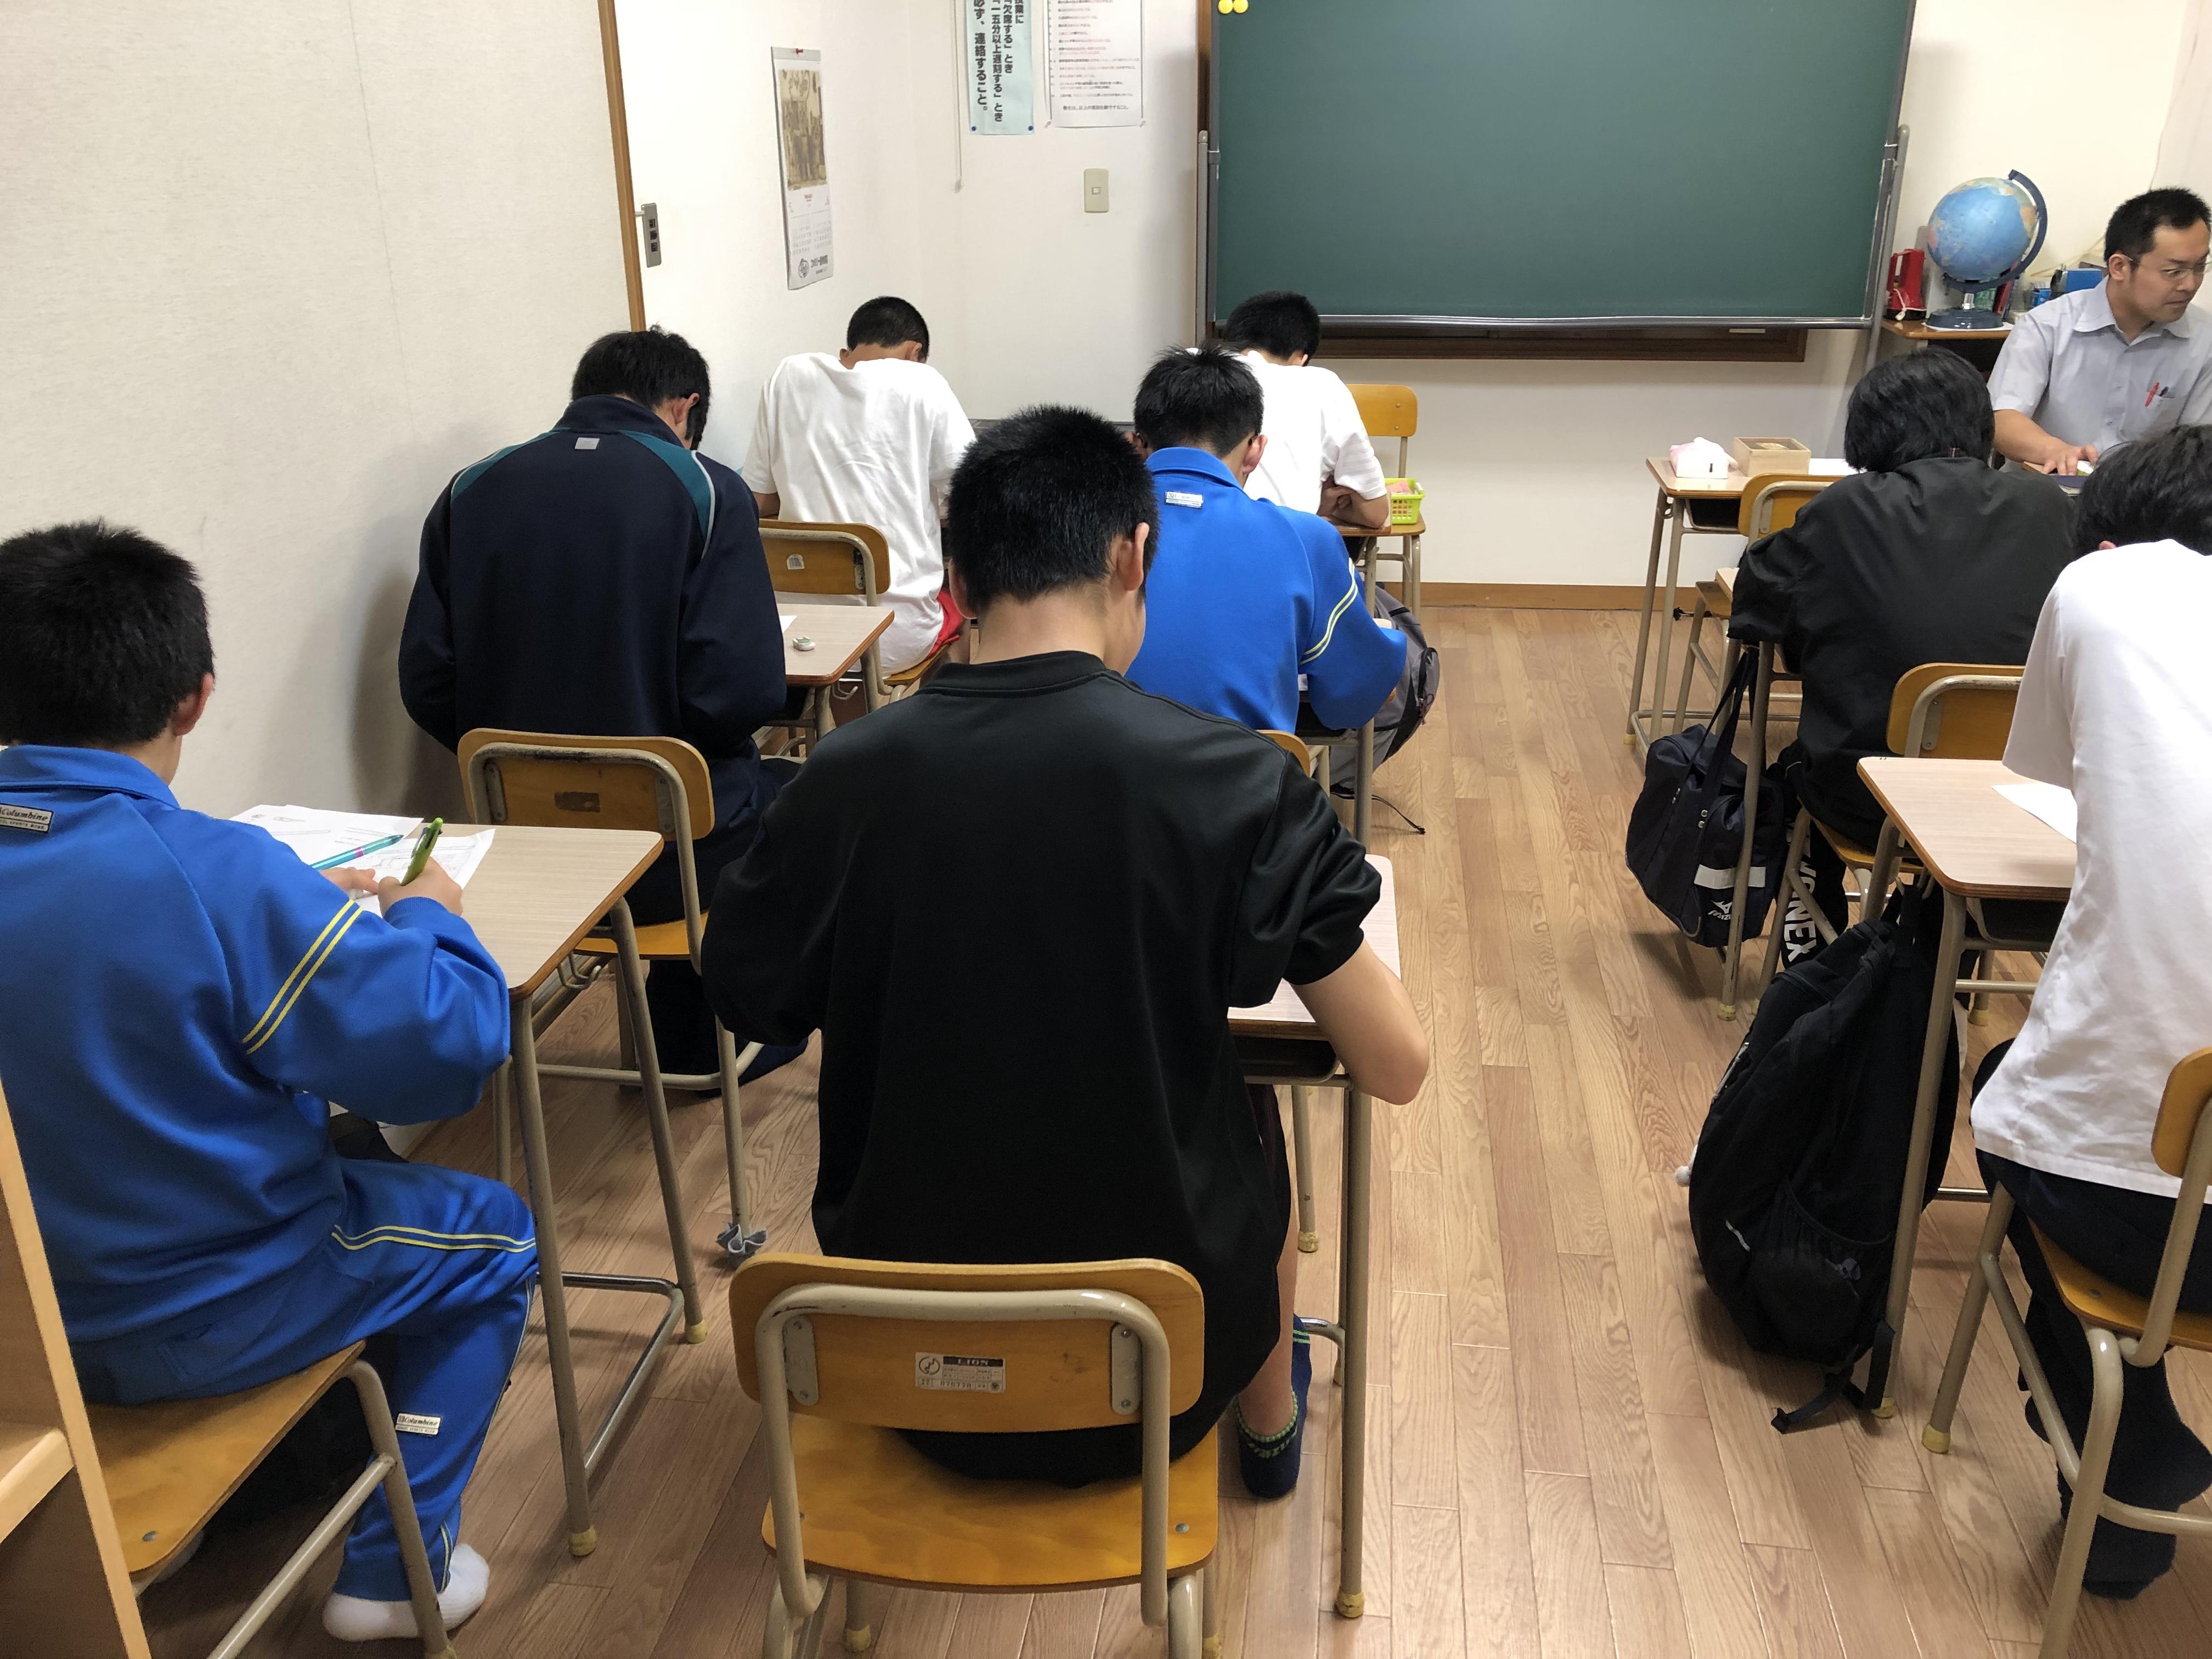 自習室の光景